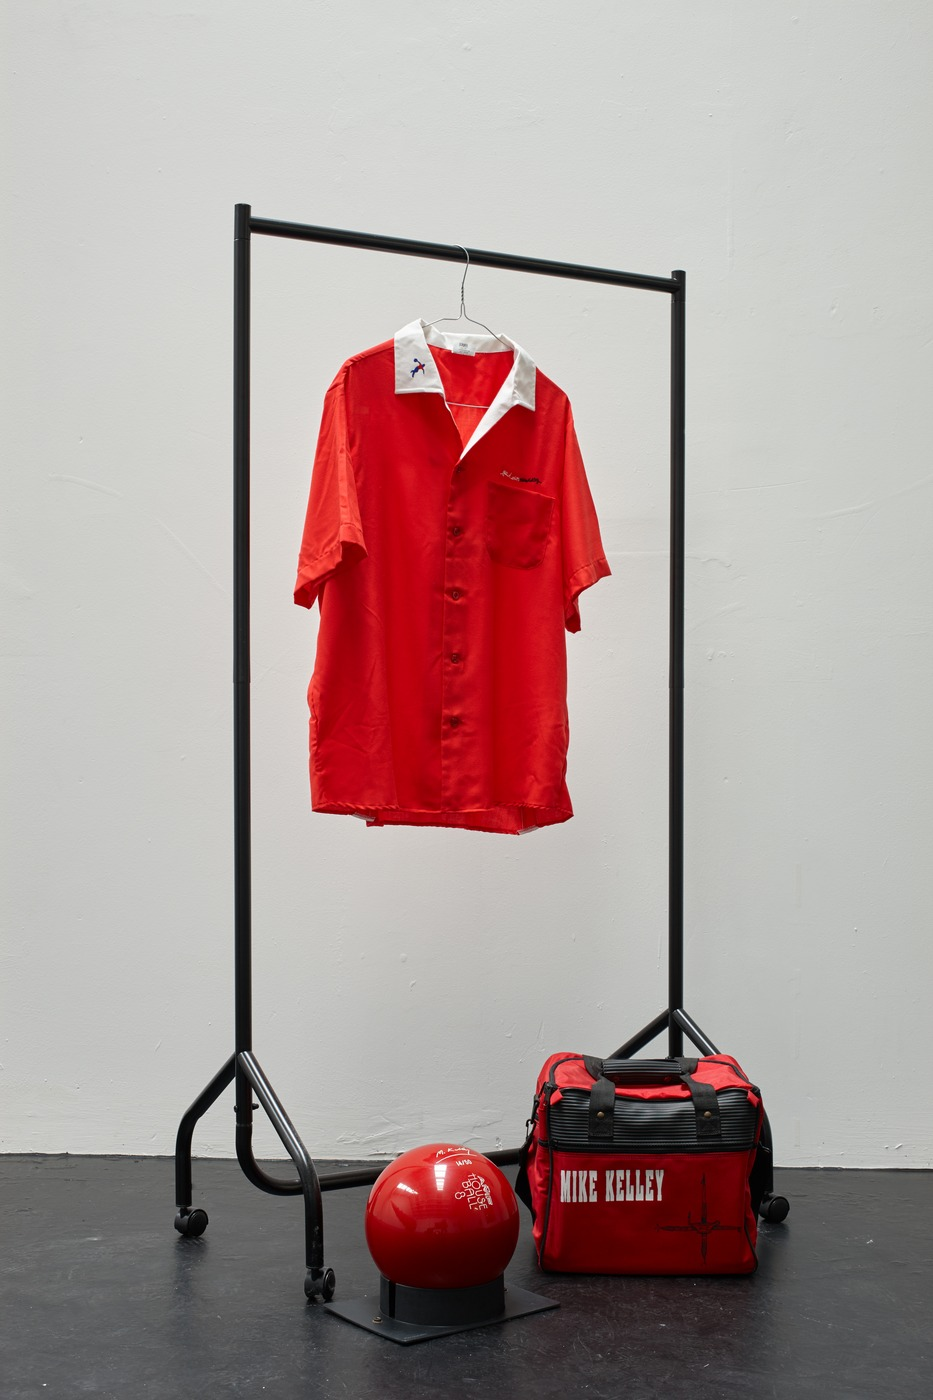 09. Mike Kelley - Untitled (Bowling Ball, Bag, and Shirt), 1991